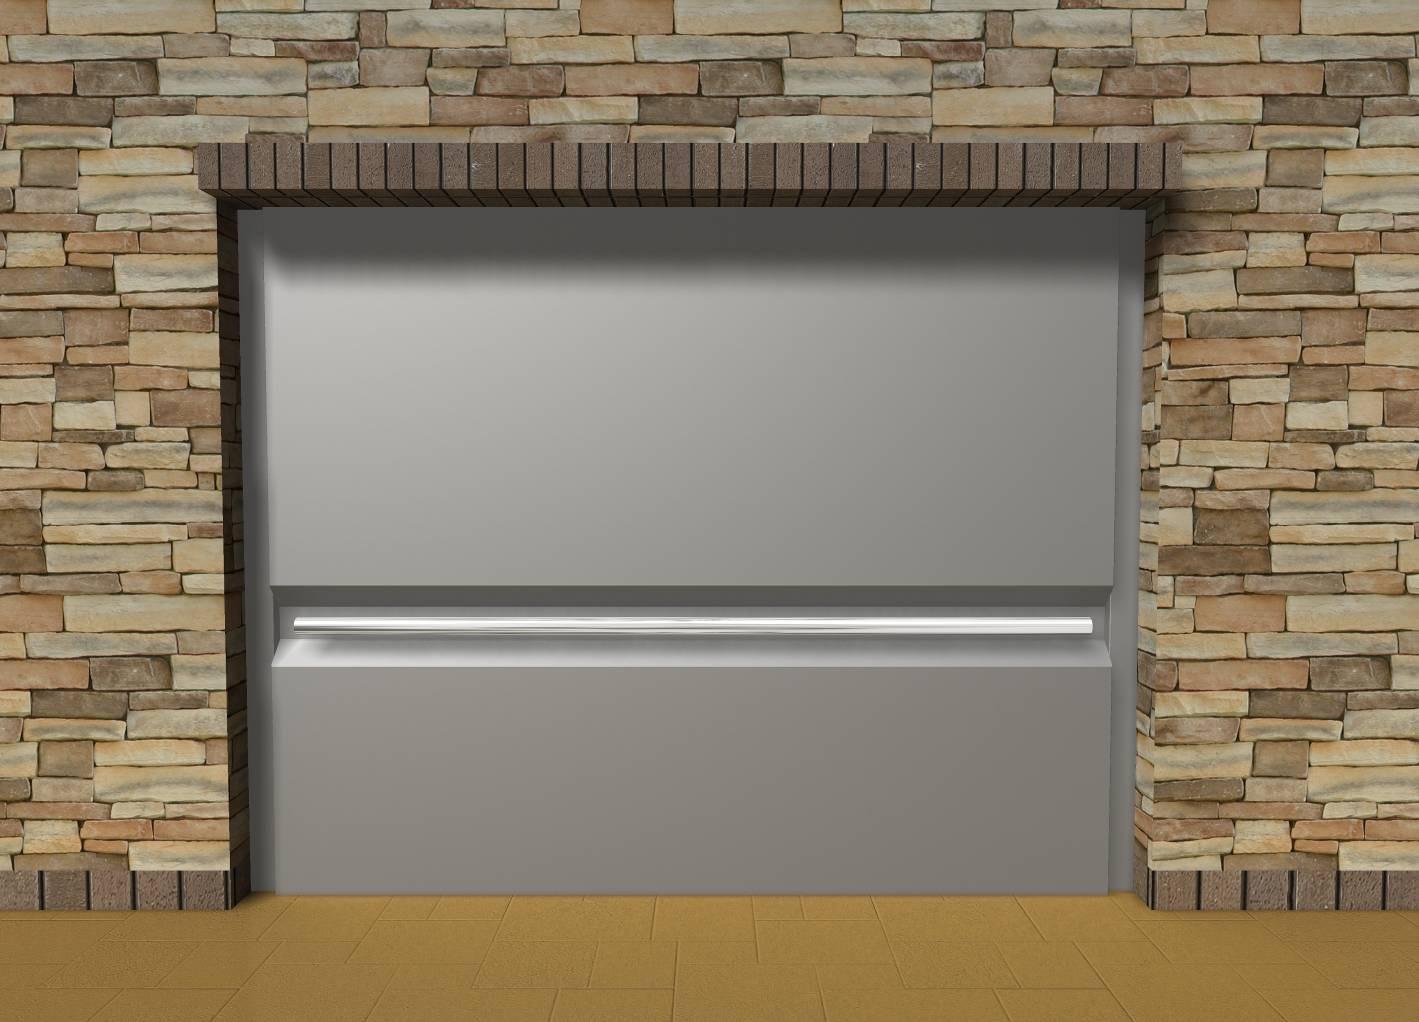 Aberturas mitre portones levadizos metalicos - Portones de madera para exterior ...